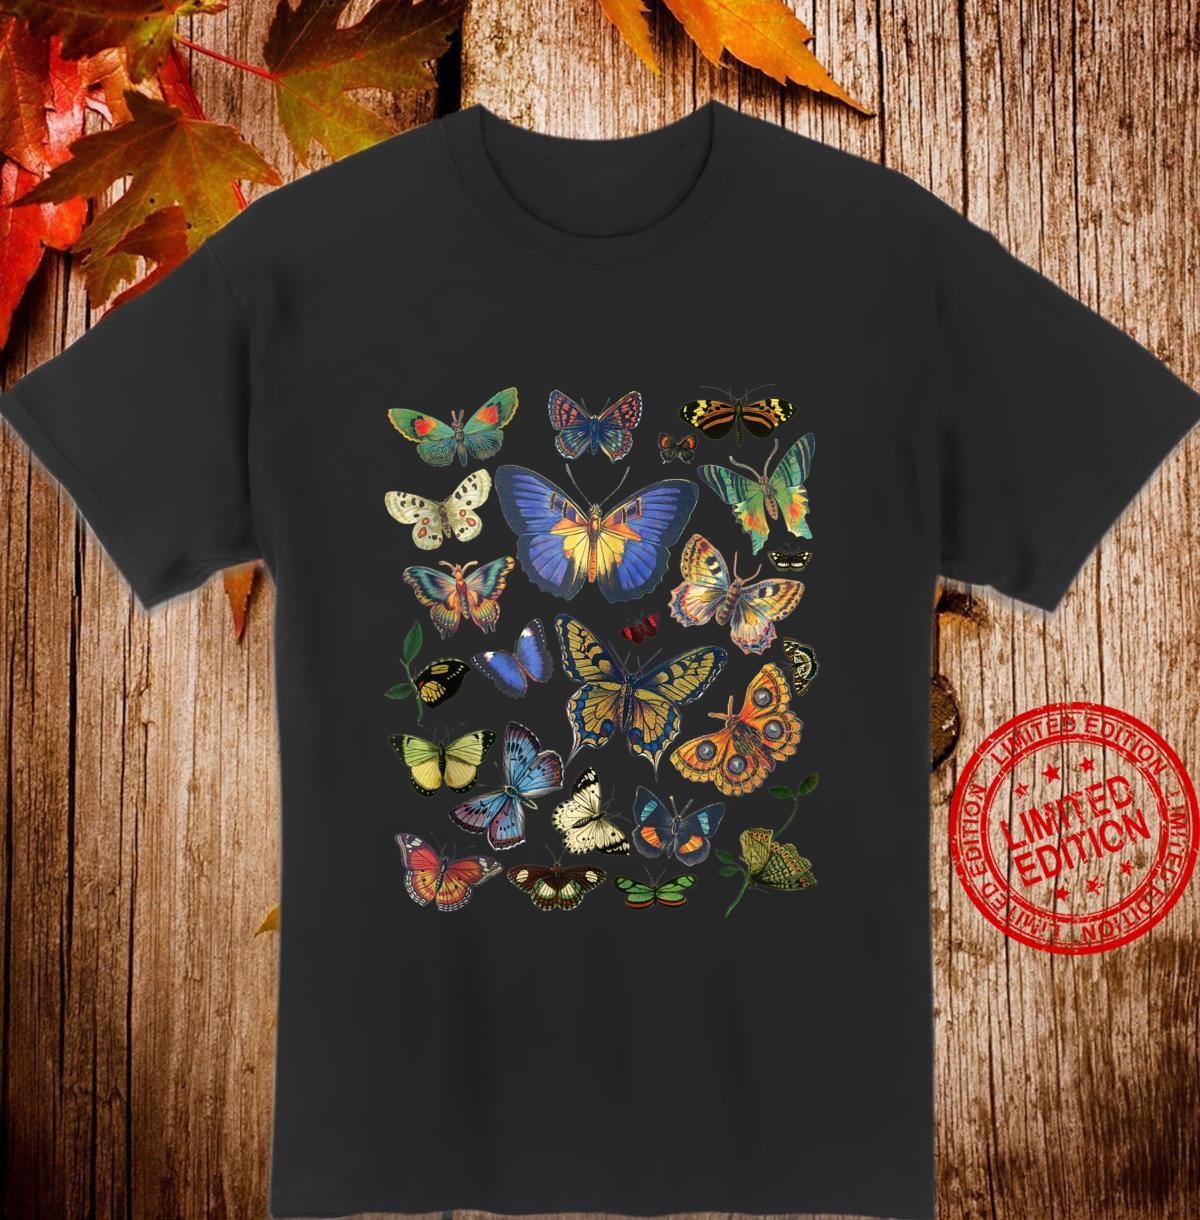 Vintage Botanical Butterfly Shirt Shirt